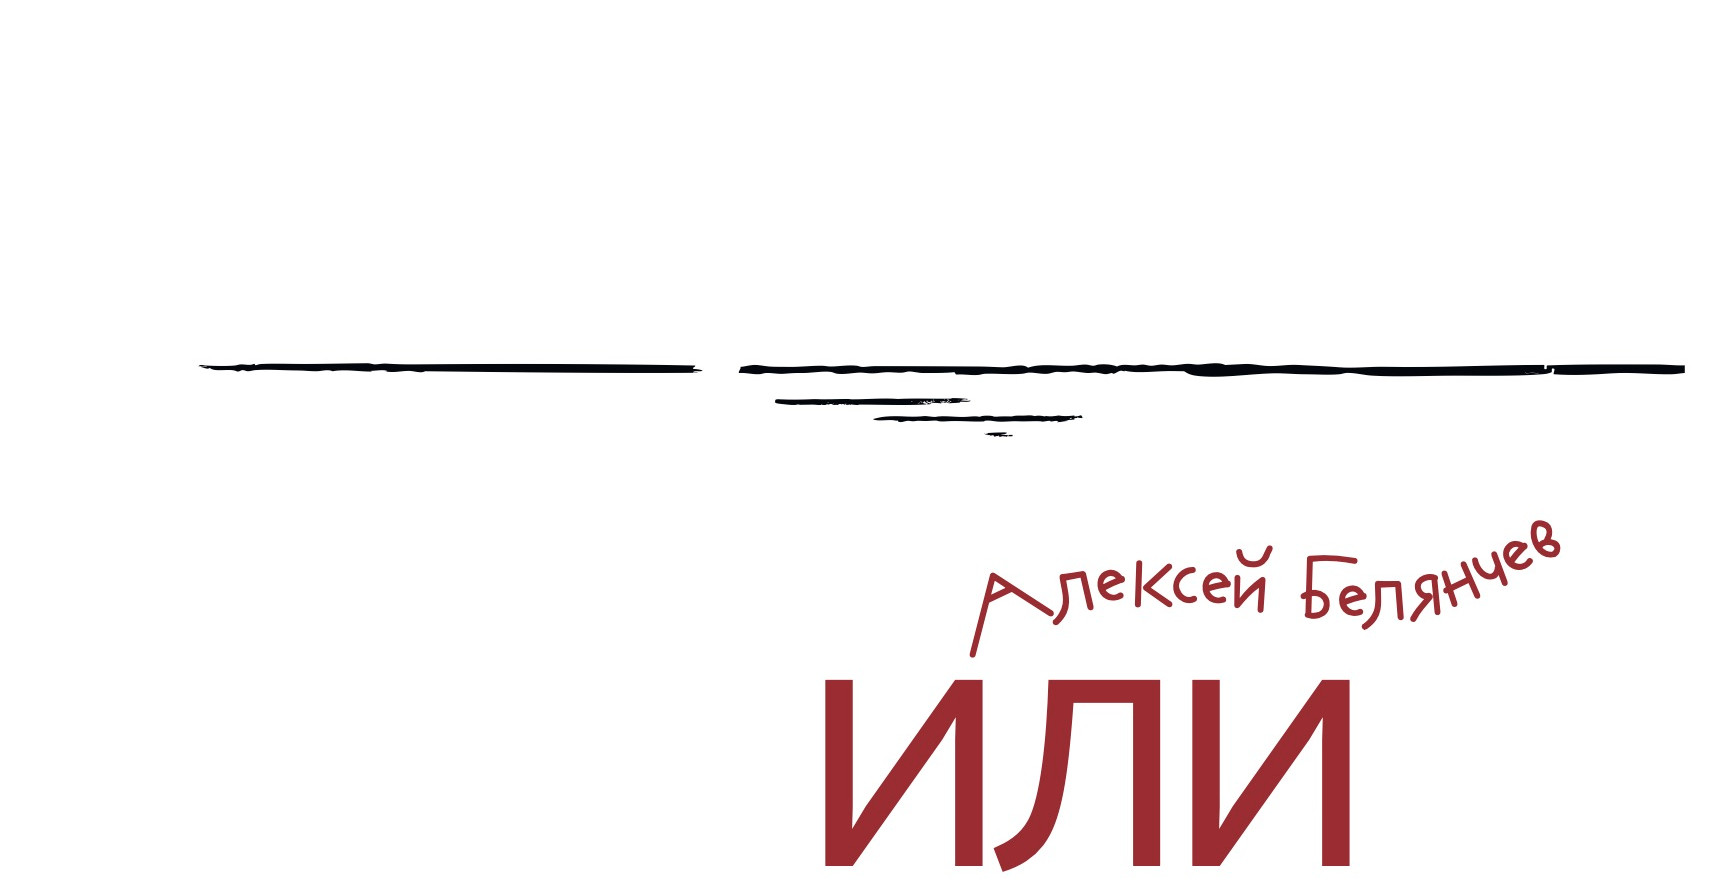 ilitak_block_001_037.jpg